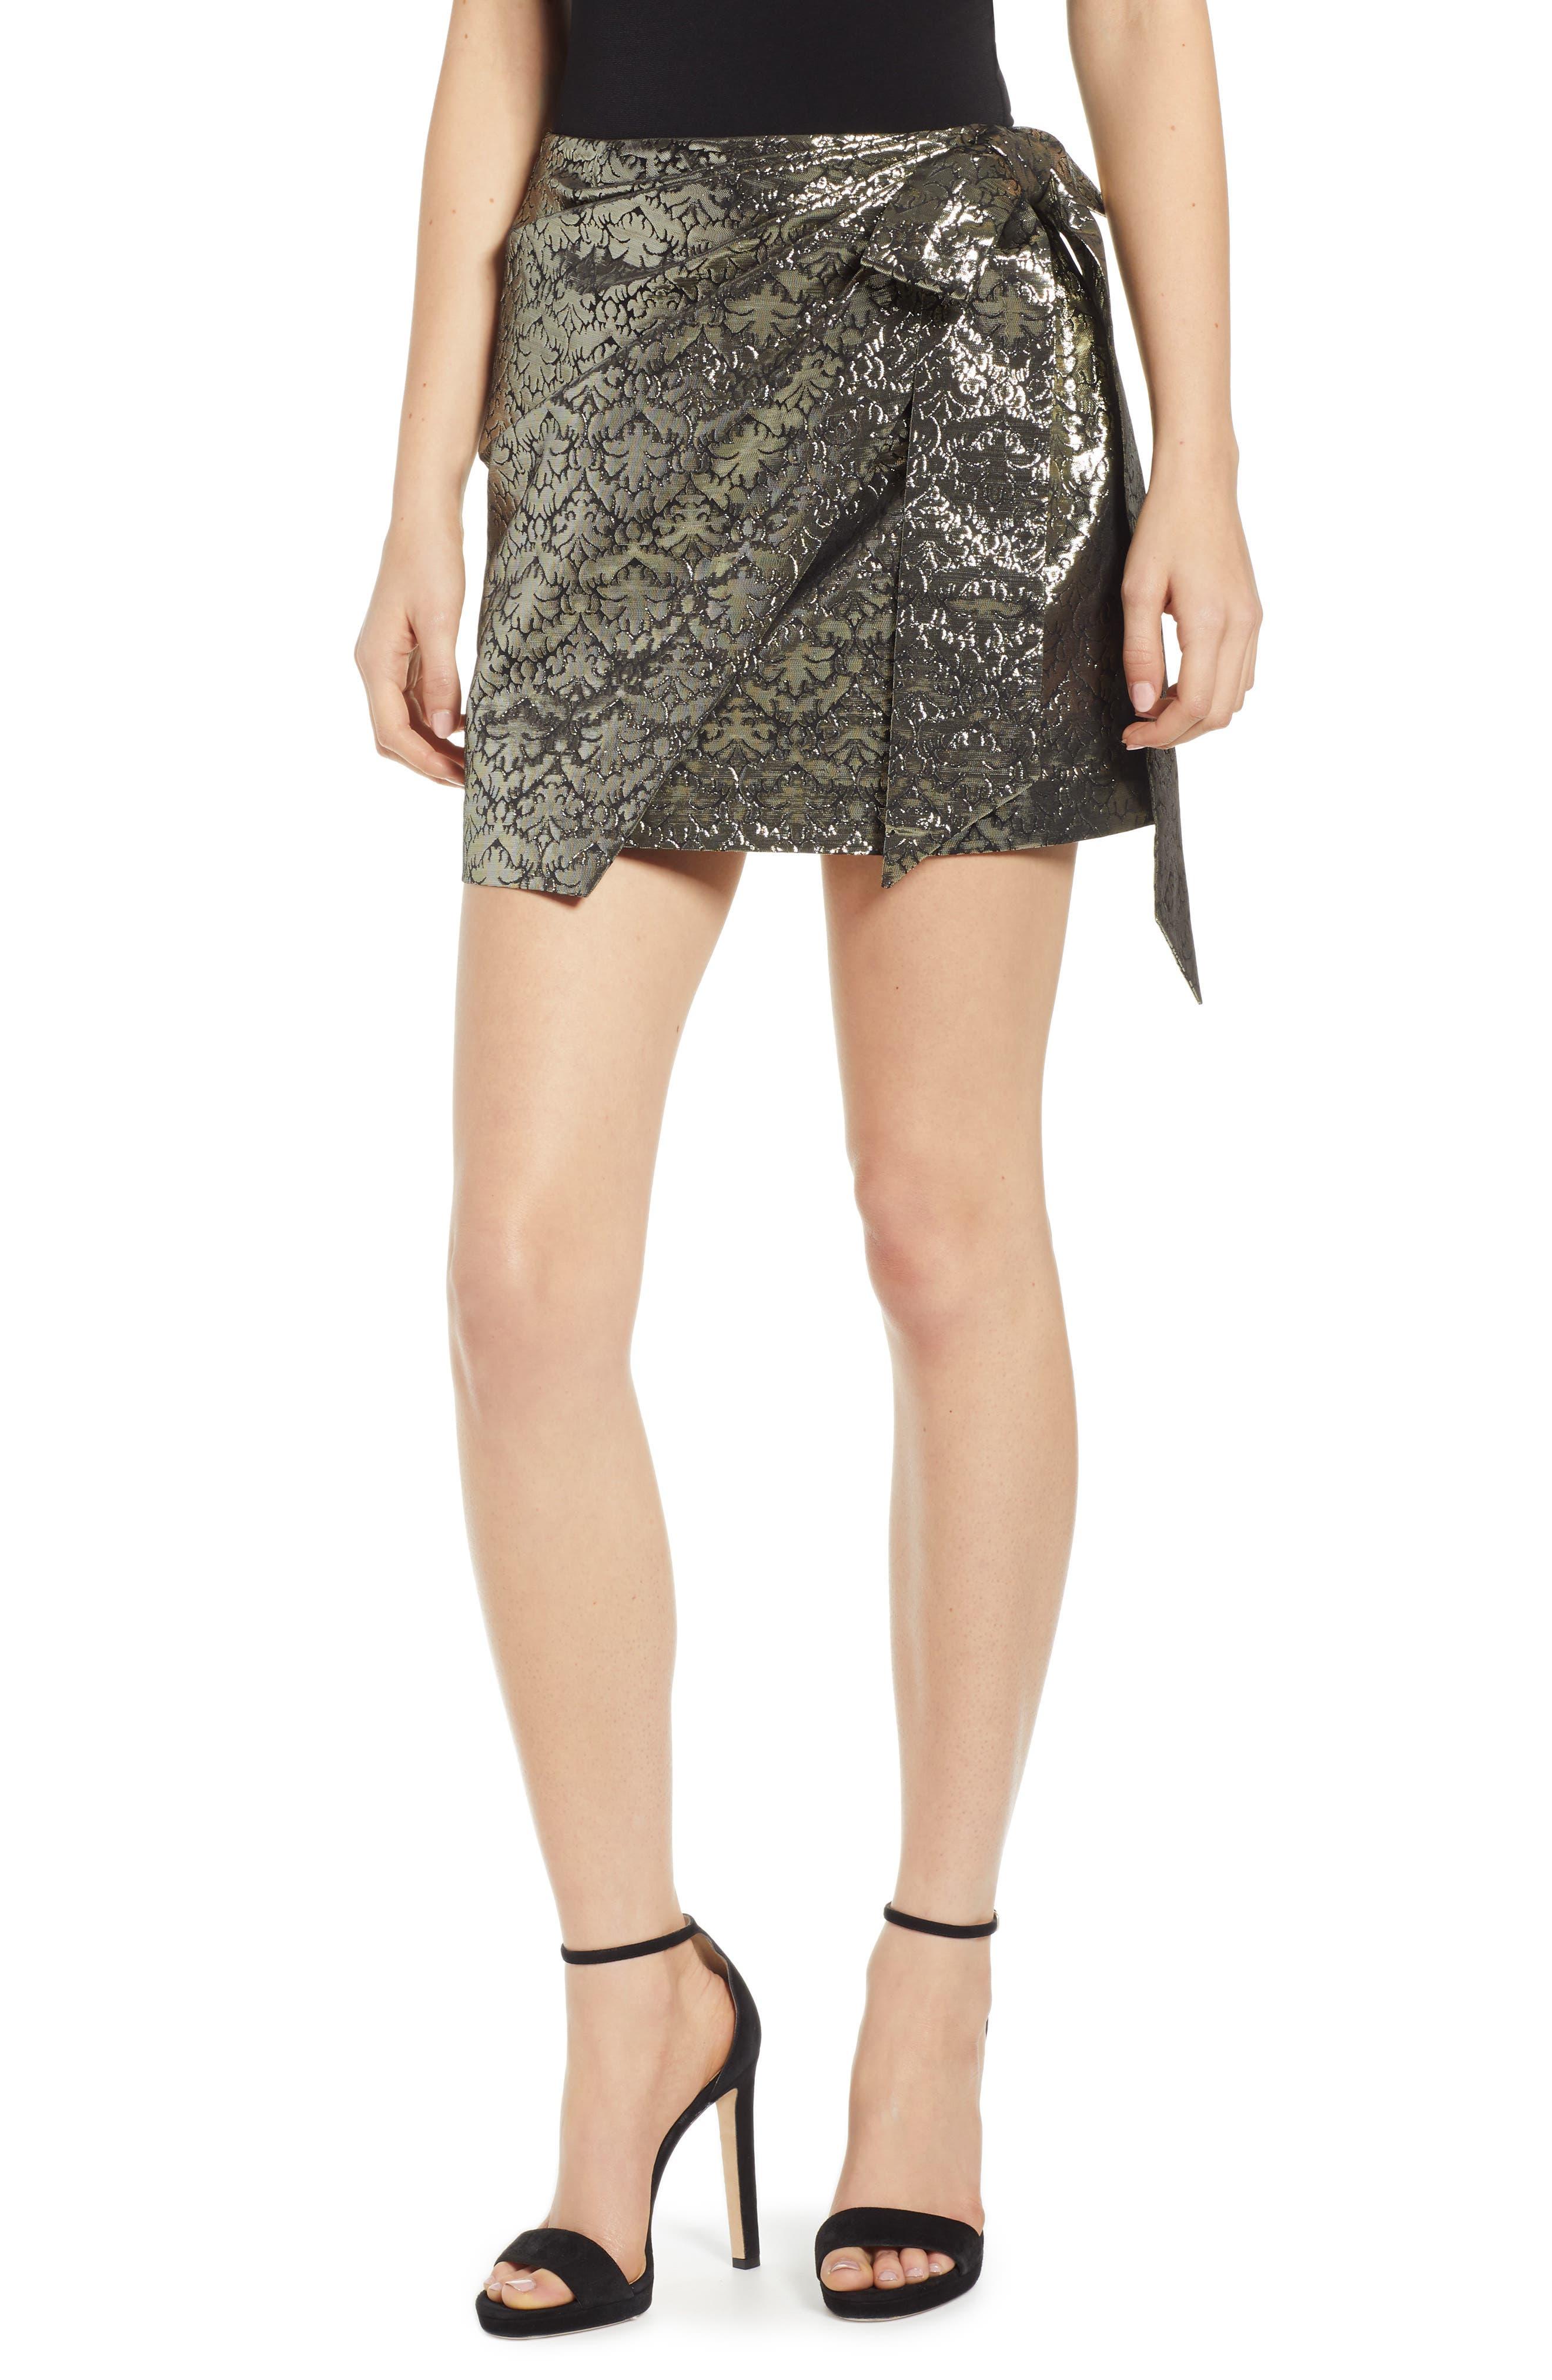 REBECCA MINKOFF, Augustina Shimmering Jacquard Faux Wrap Skirt, Main thumbnail 1, color, 710